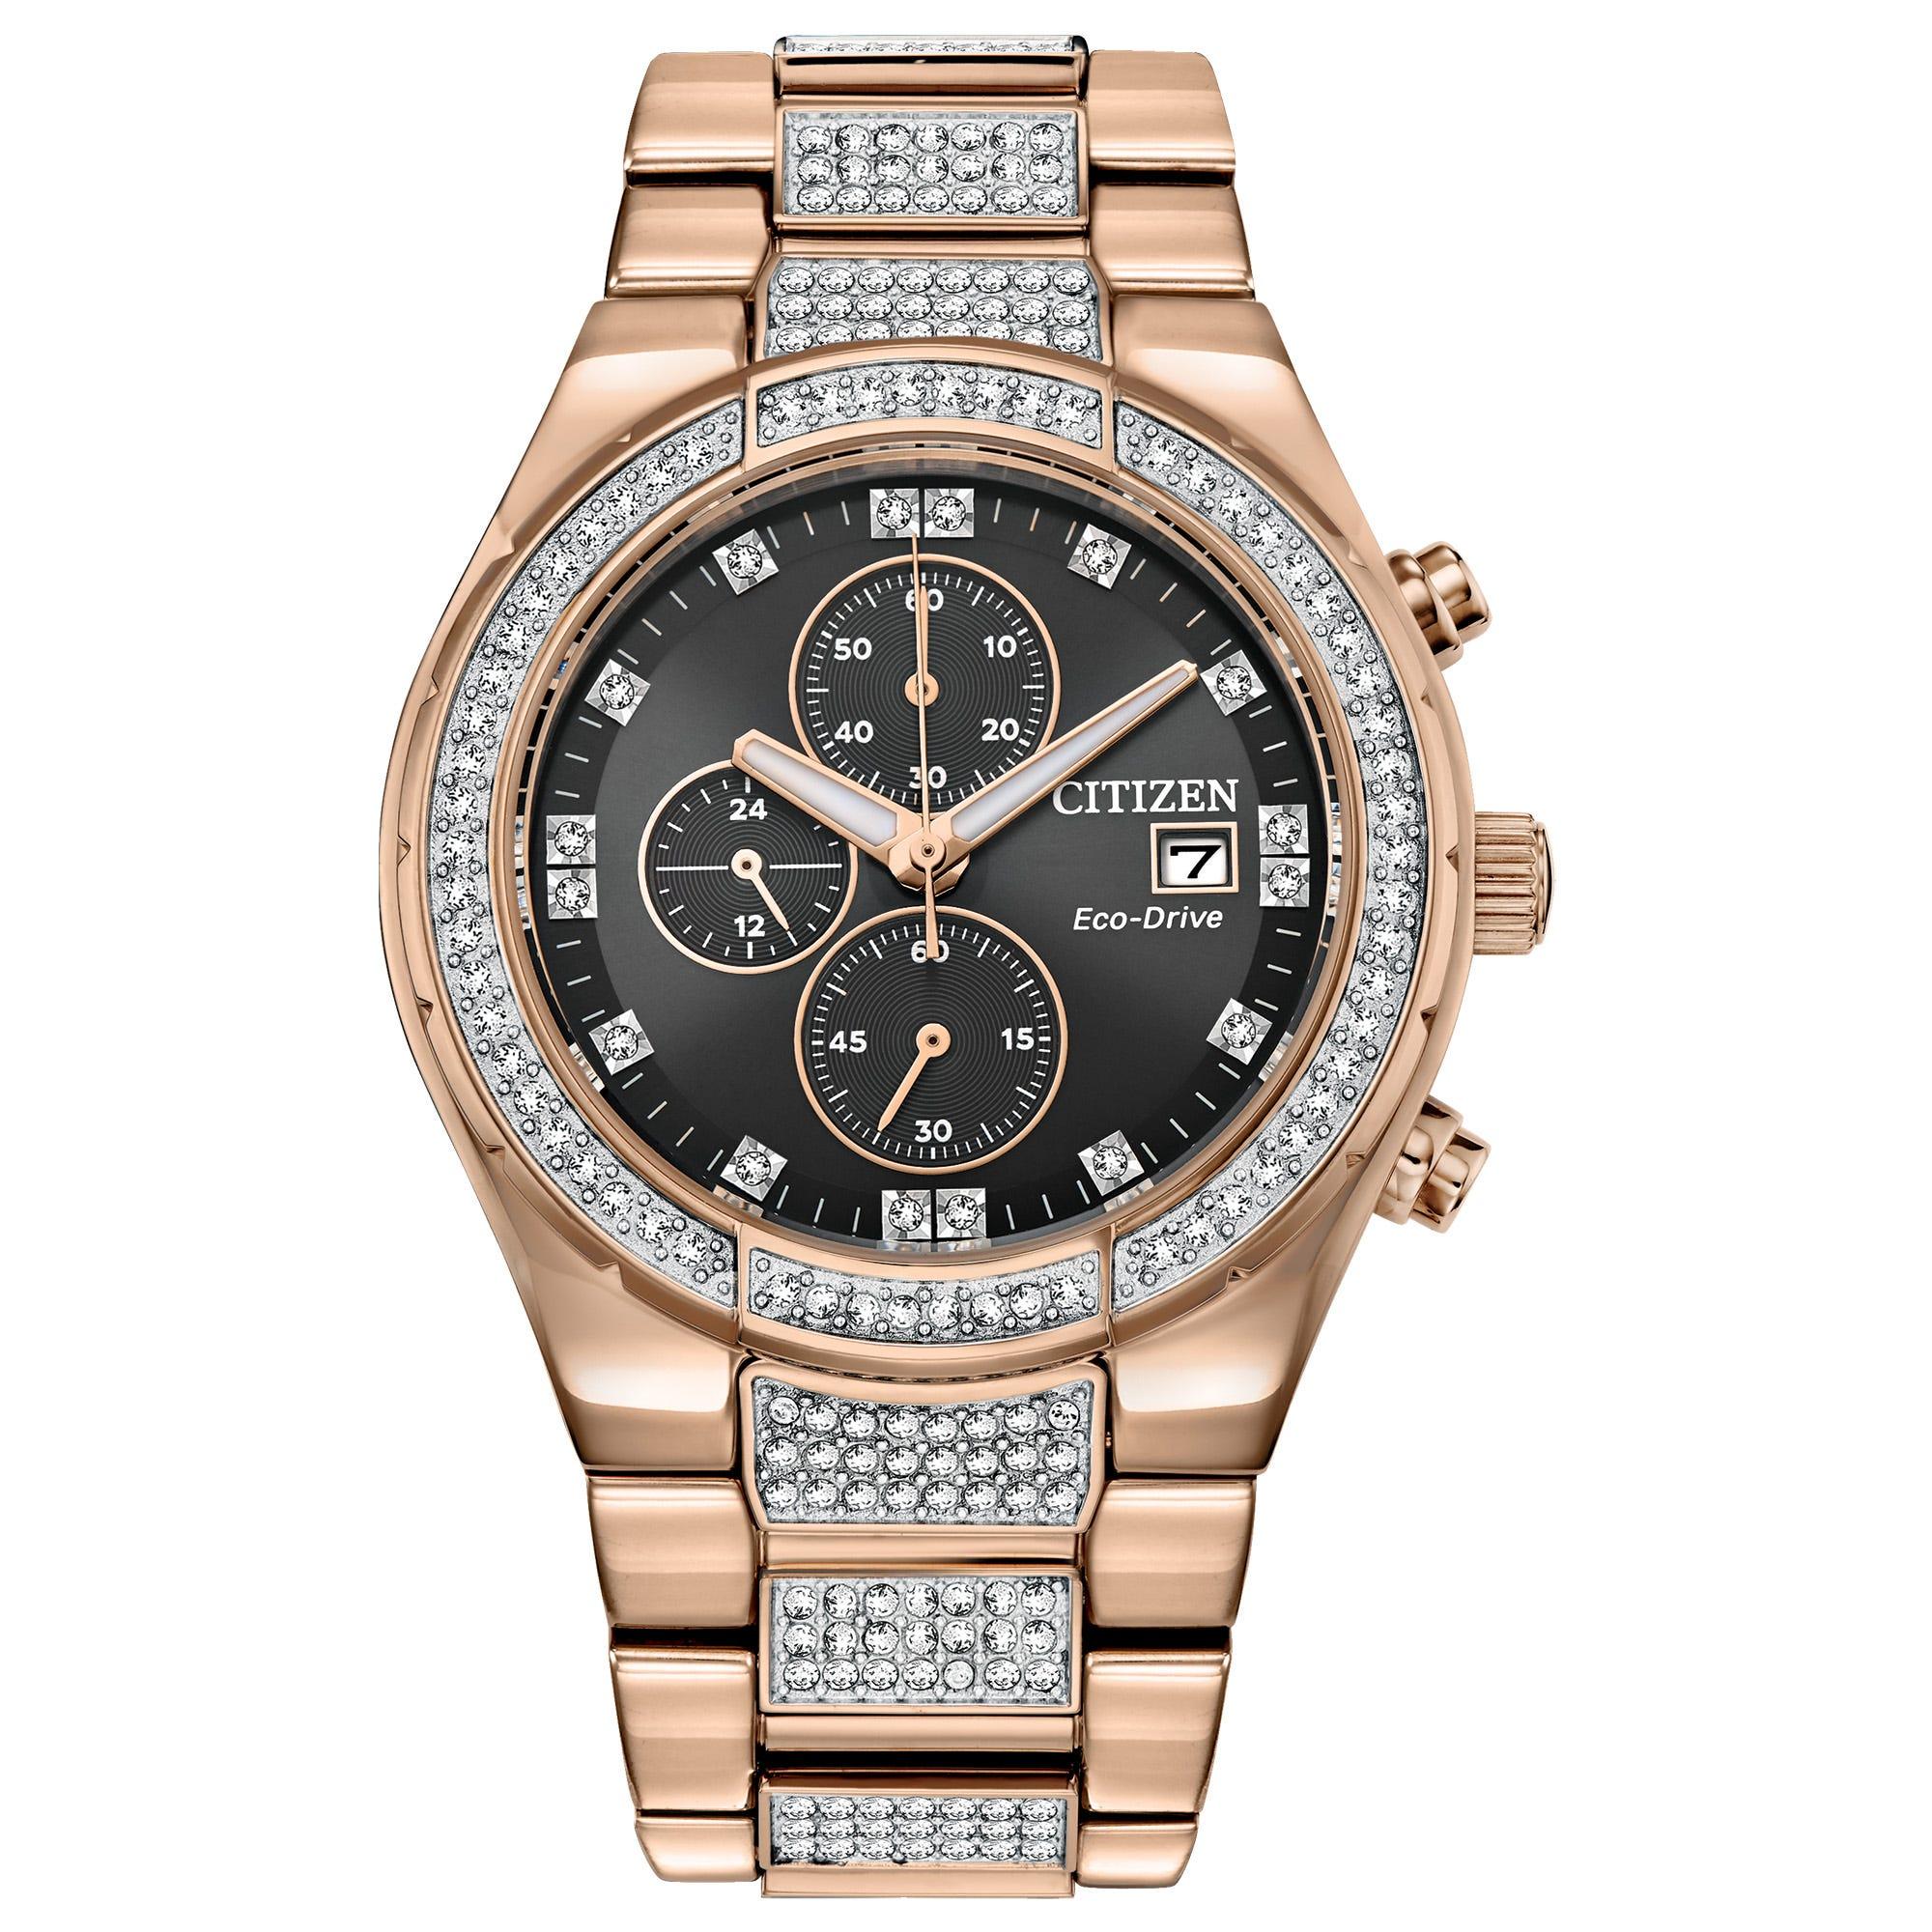 Citizen Men's Eco-Drive Crystal Watch CA0753-55E